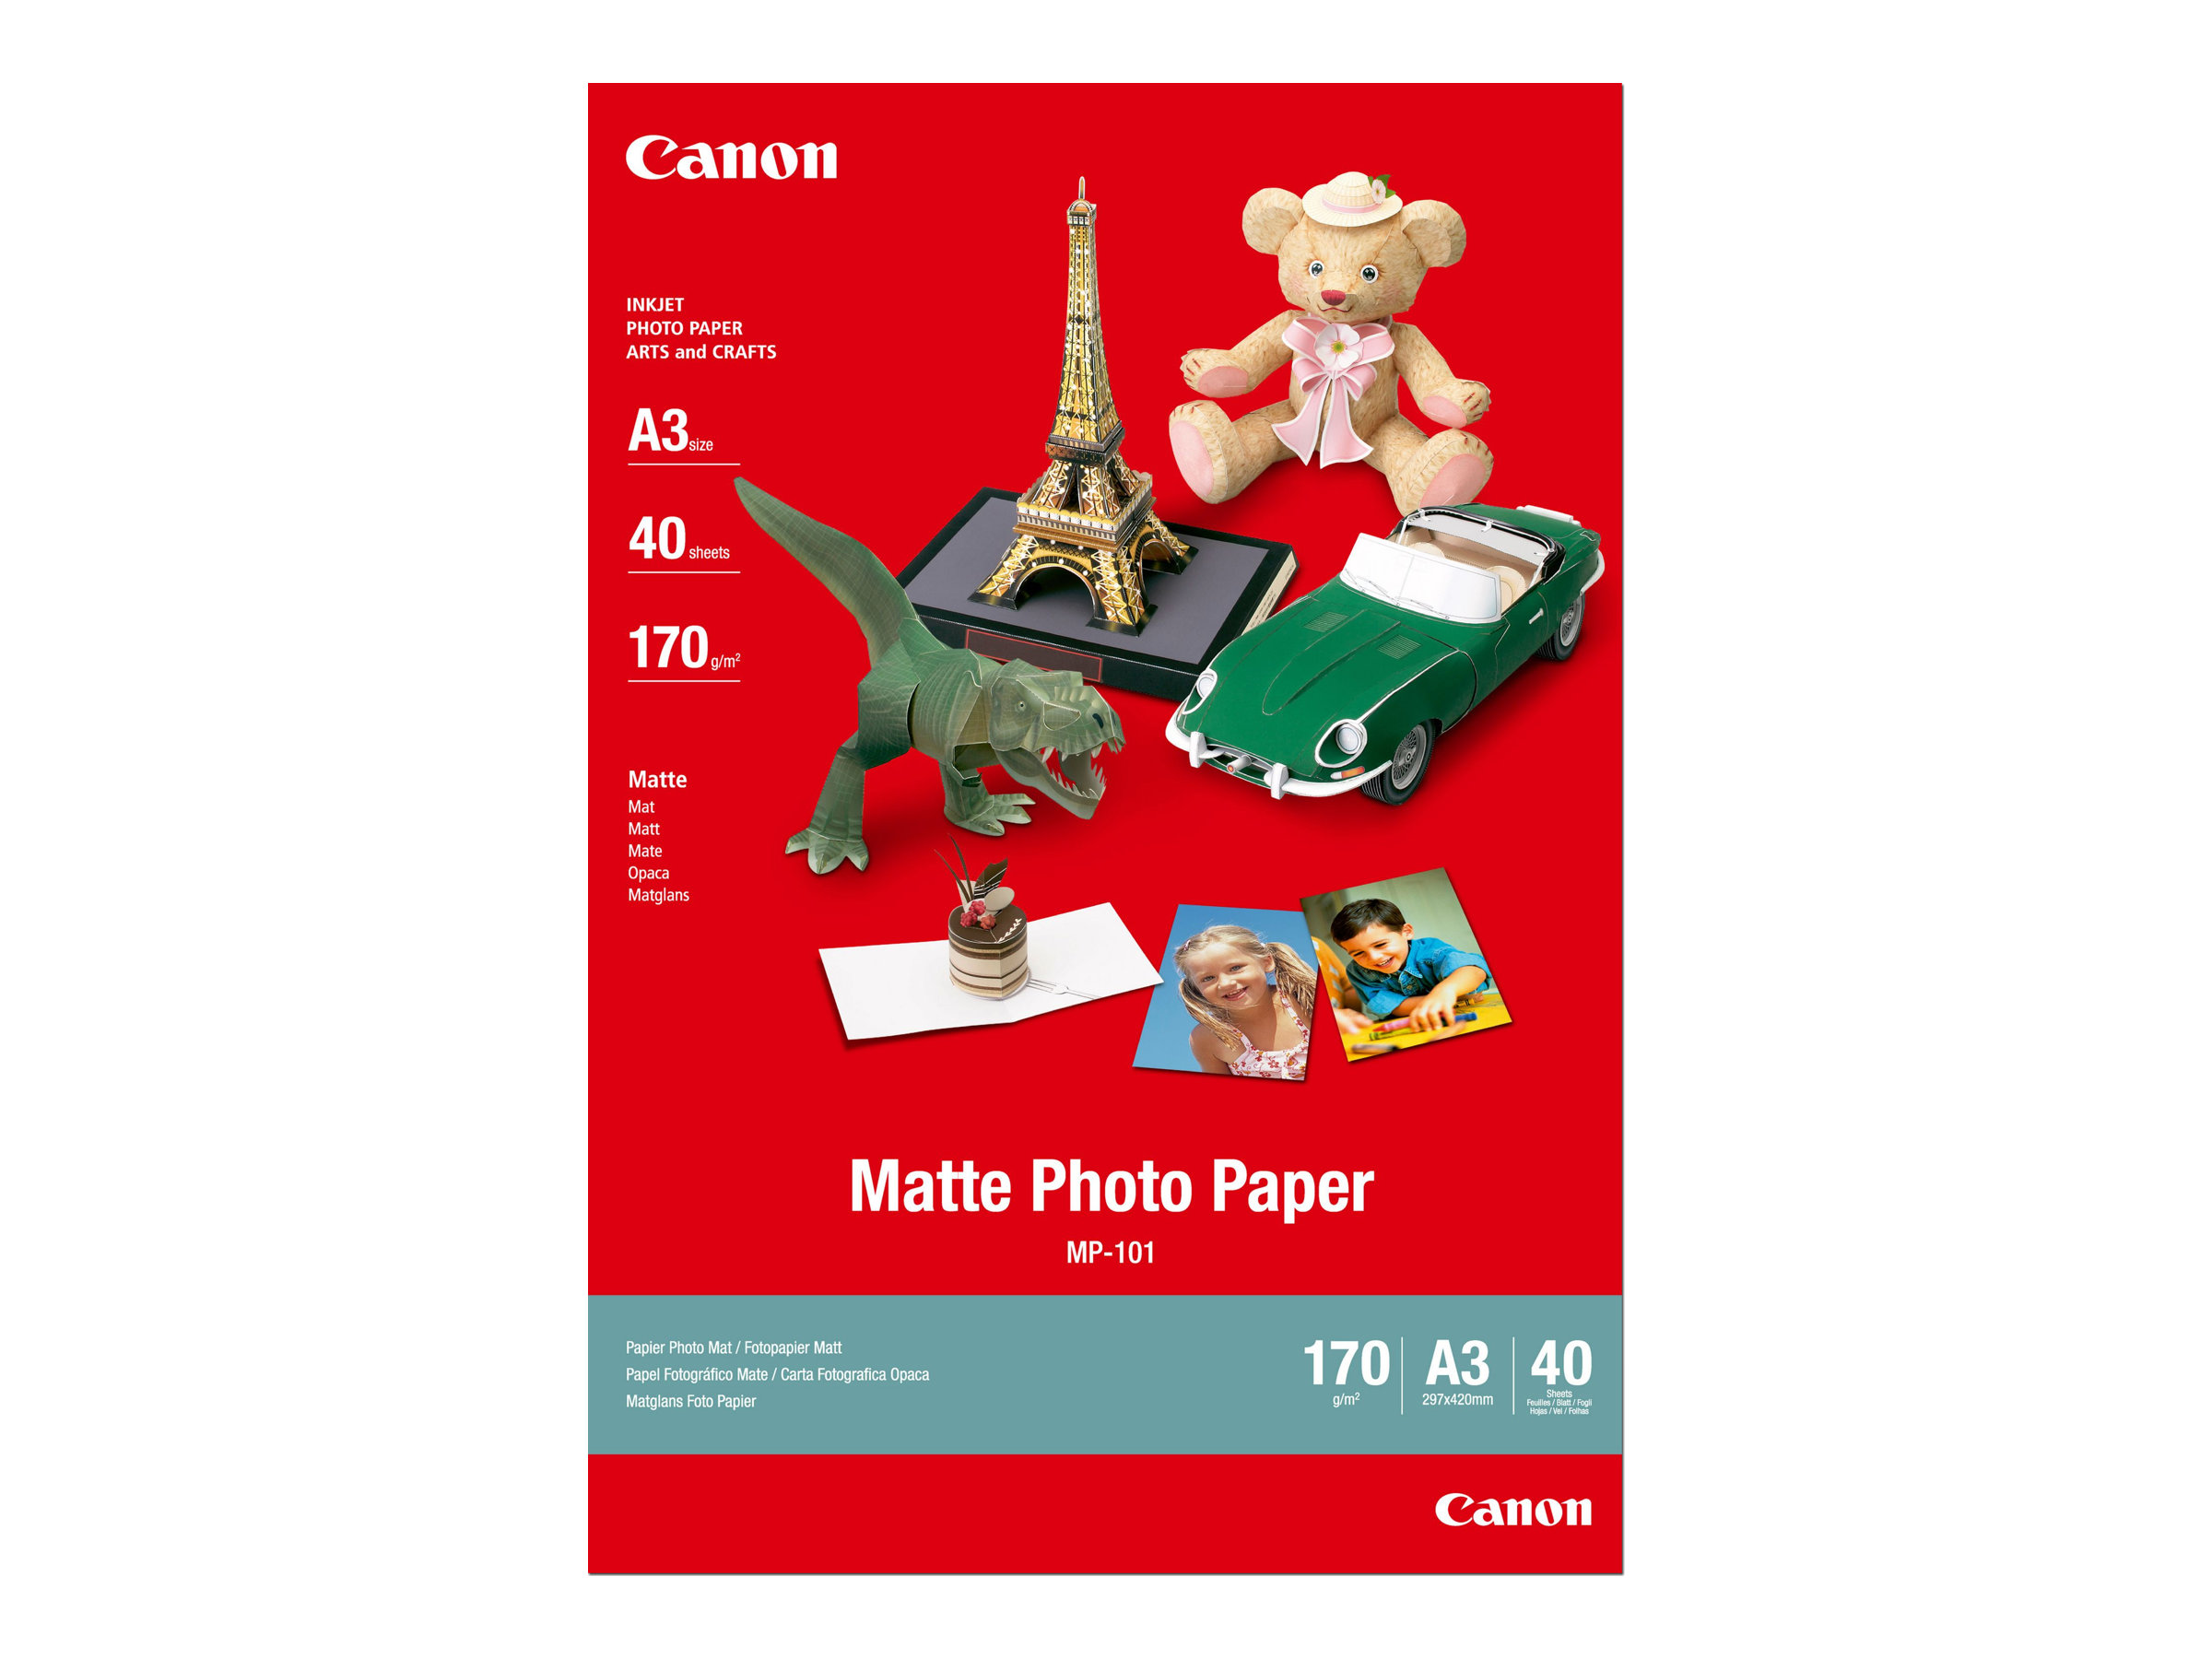 Canon MP-101 - A3 (297 x 420 mm) - 170 g/m² - 40 Blatt Fotopapier - für i6500, 9100, 9950; PIXMA iX7000; S6300, 9000